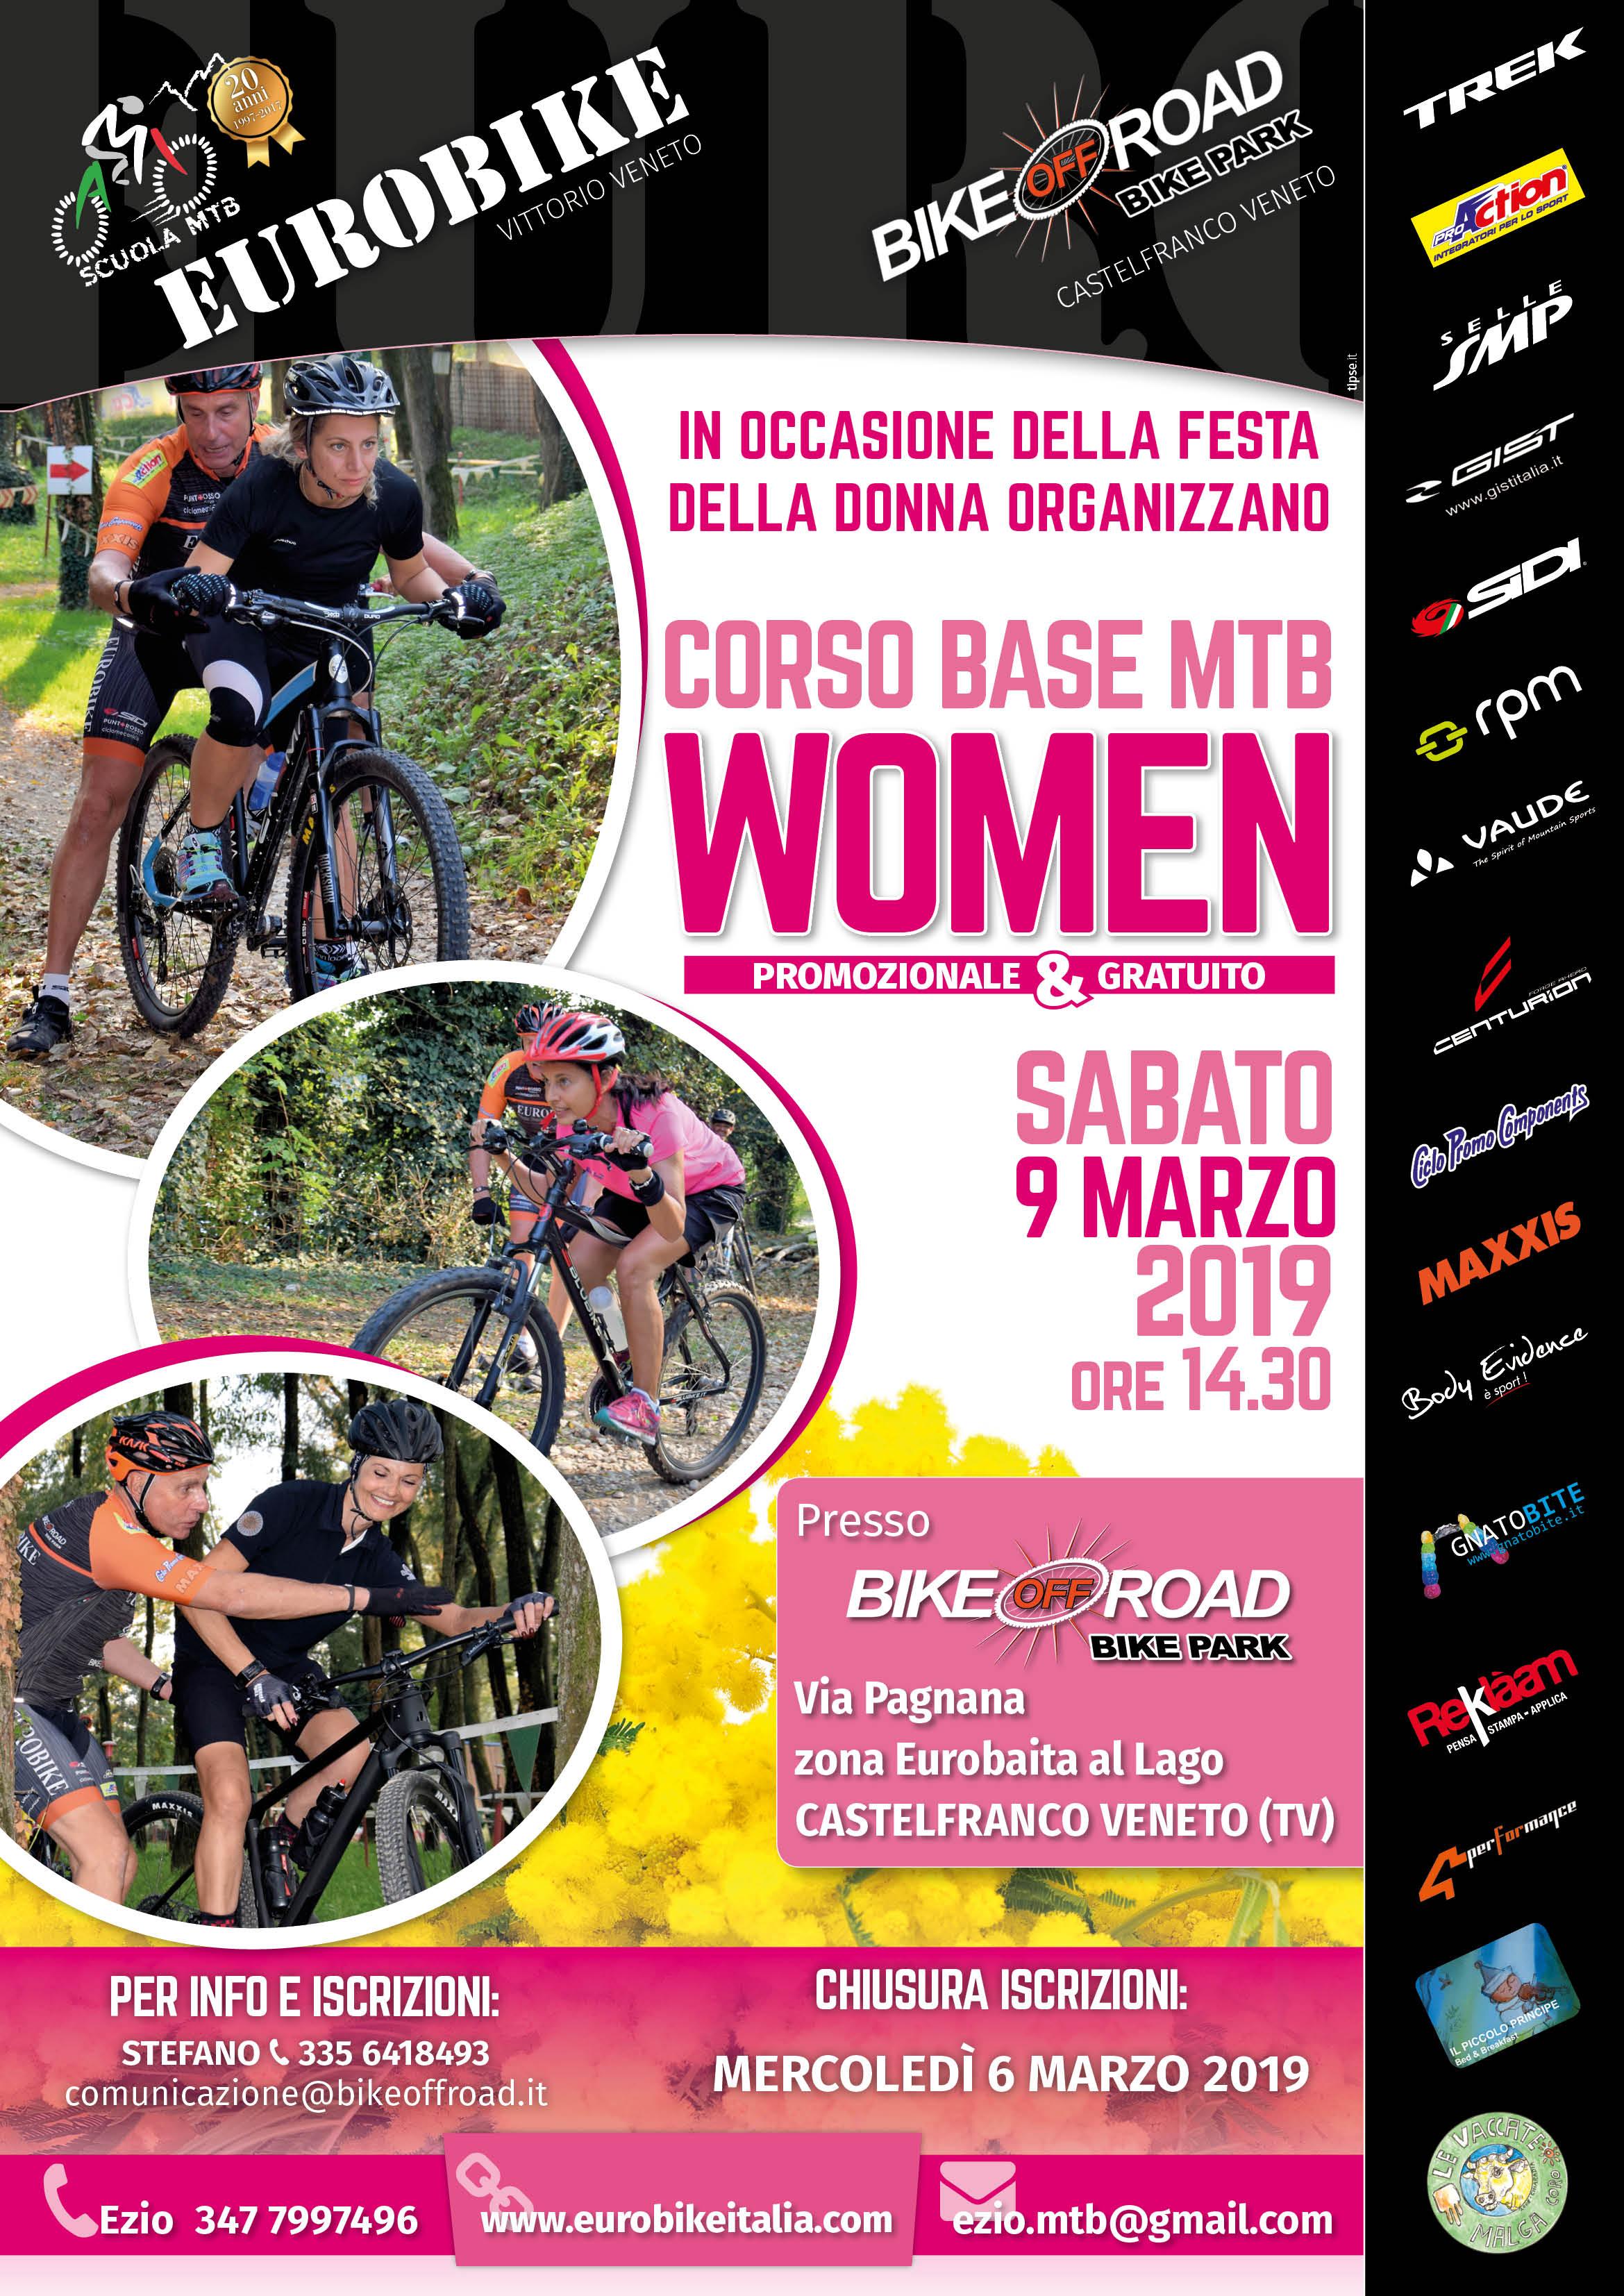 09.03.2019 Corso Tecnica Base MTB Woman